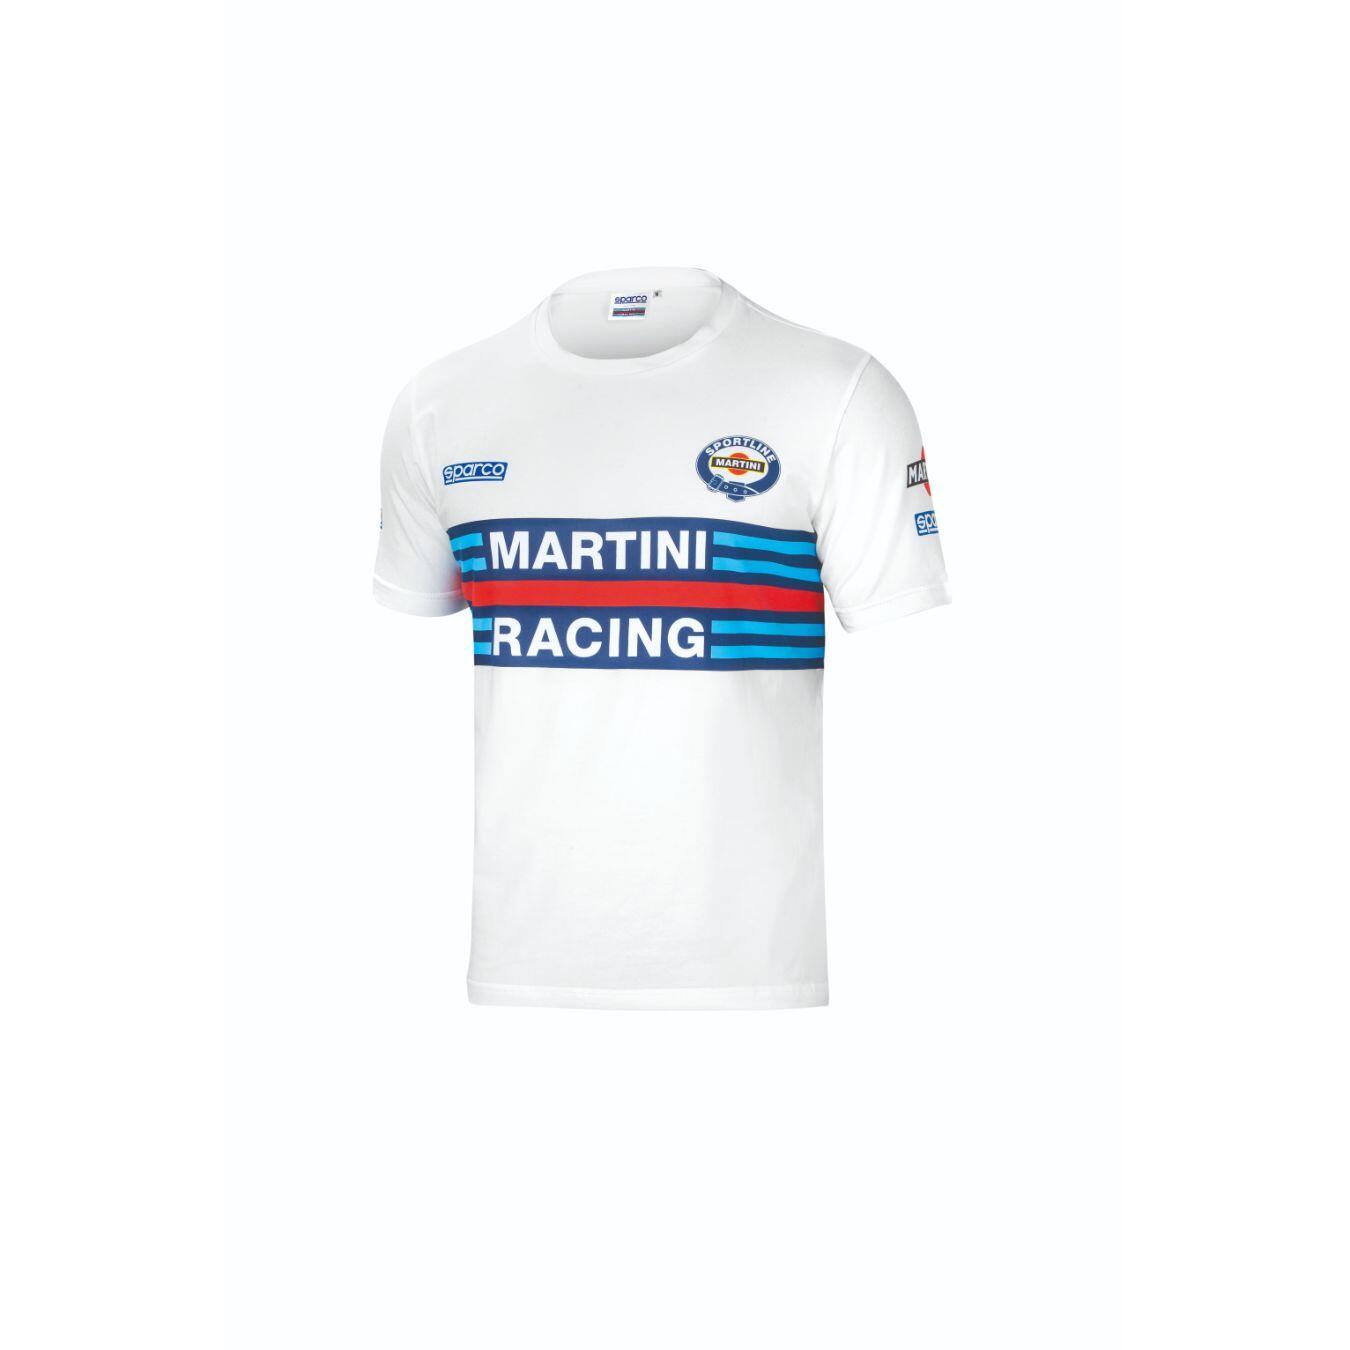 Sparco Martini T-shirt wit - voor mannen